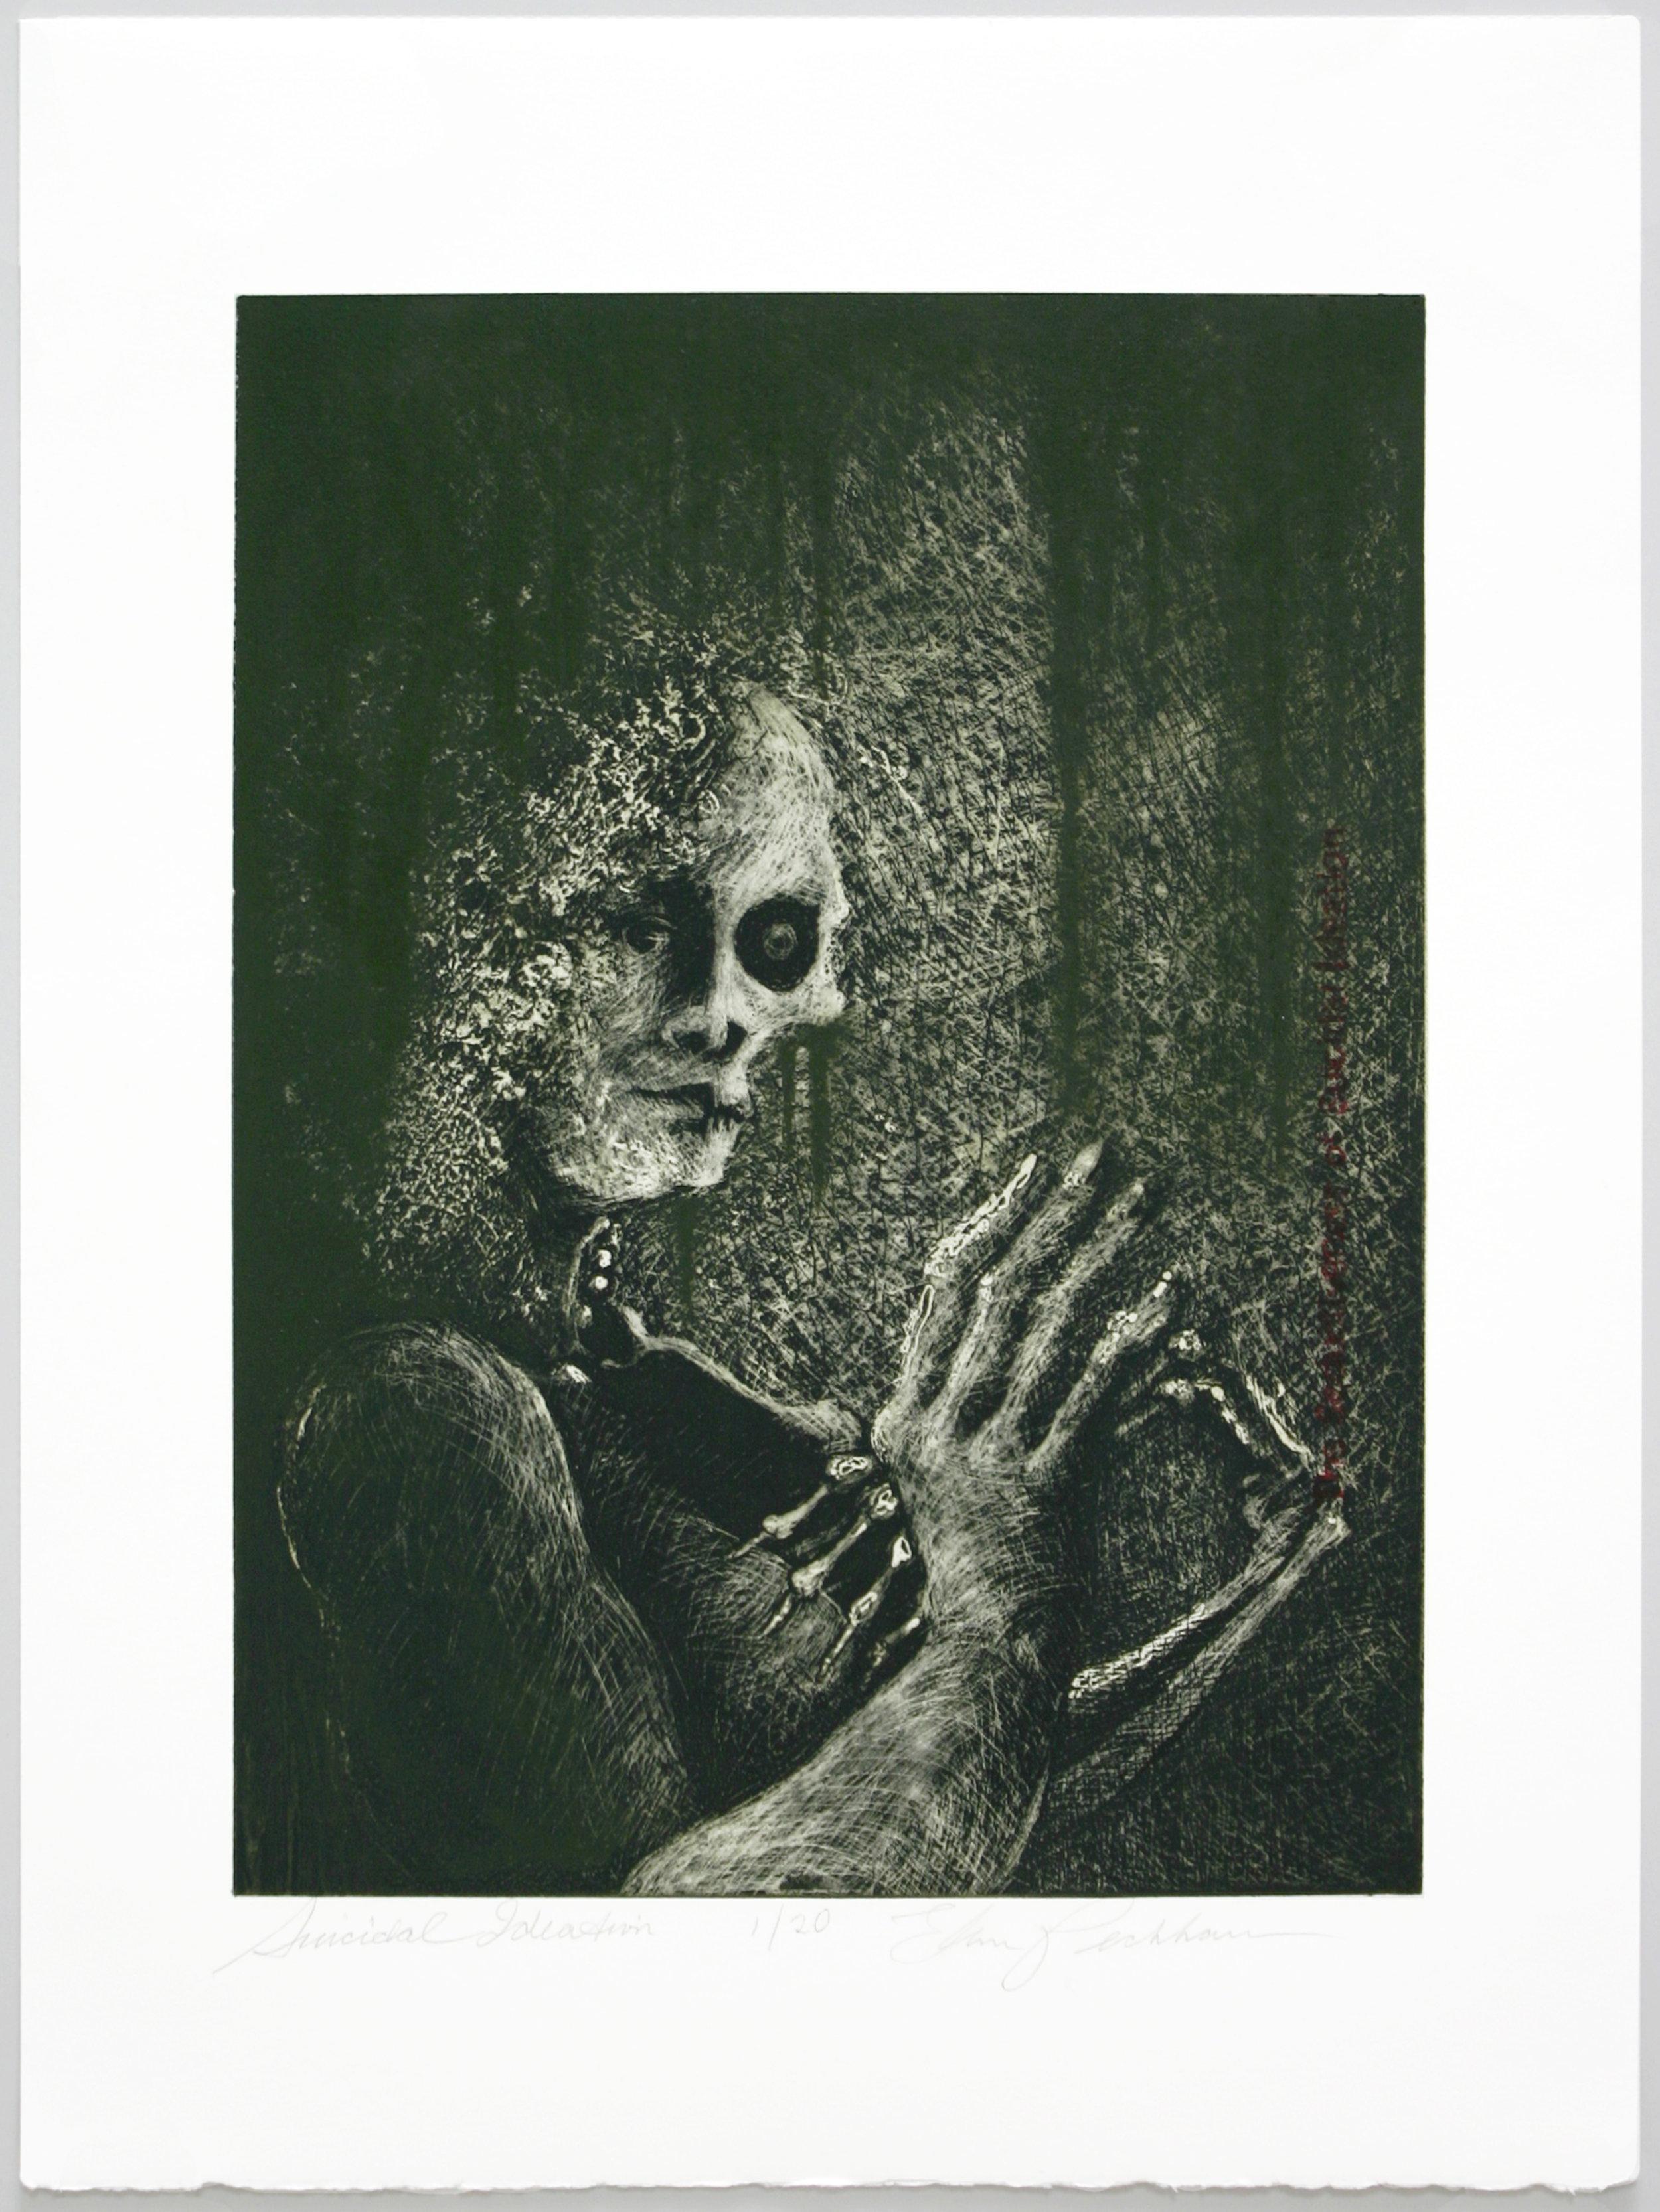 """Suicidal Ideation""   Ellen Peckham  Solarplate etching"